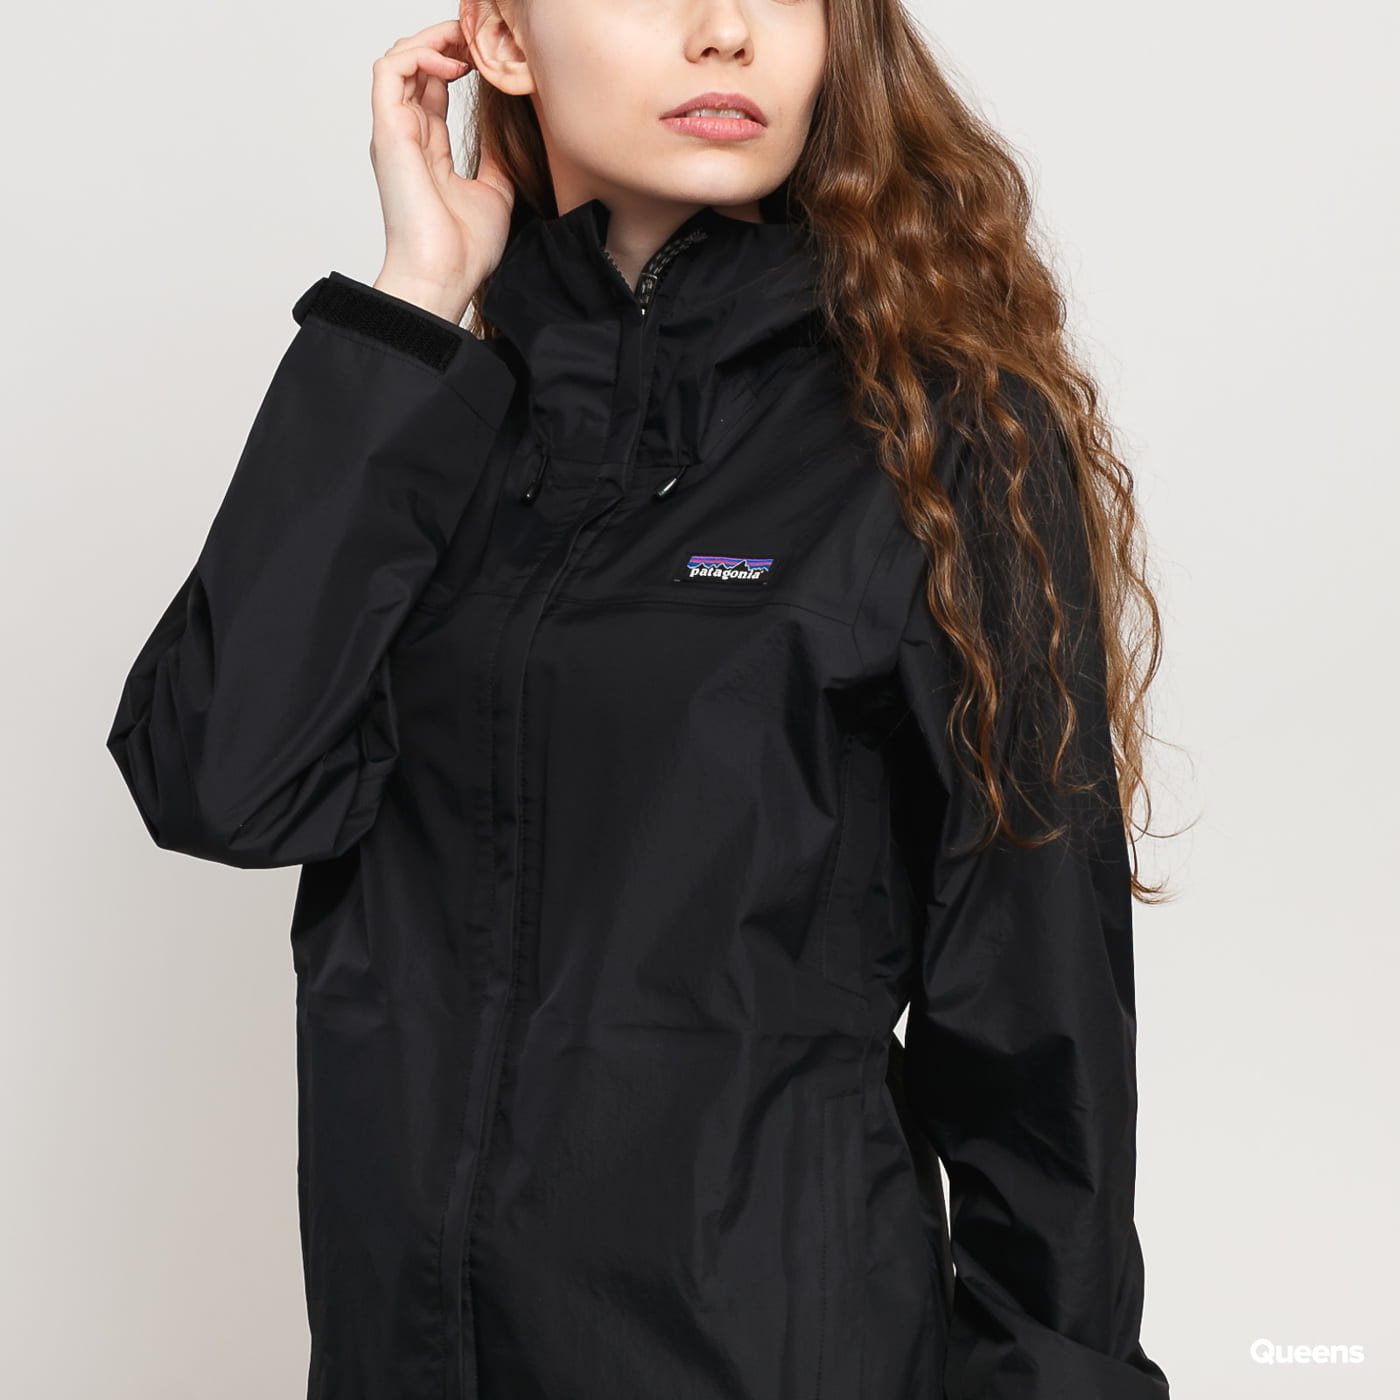 Patagonia W's Torrentshell 3L Jacket black